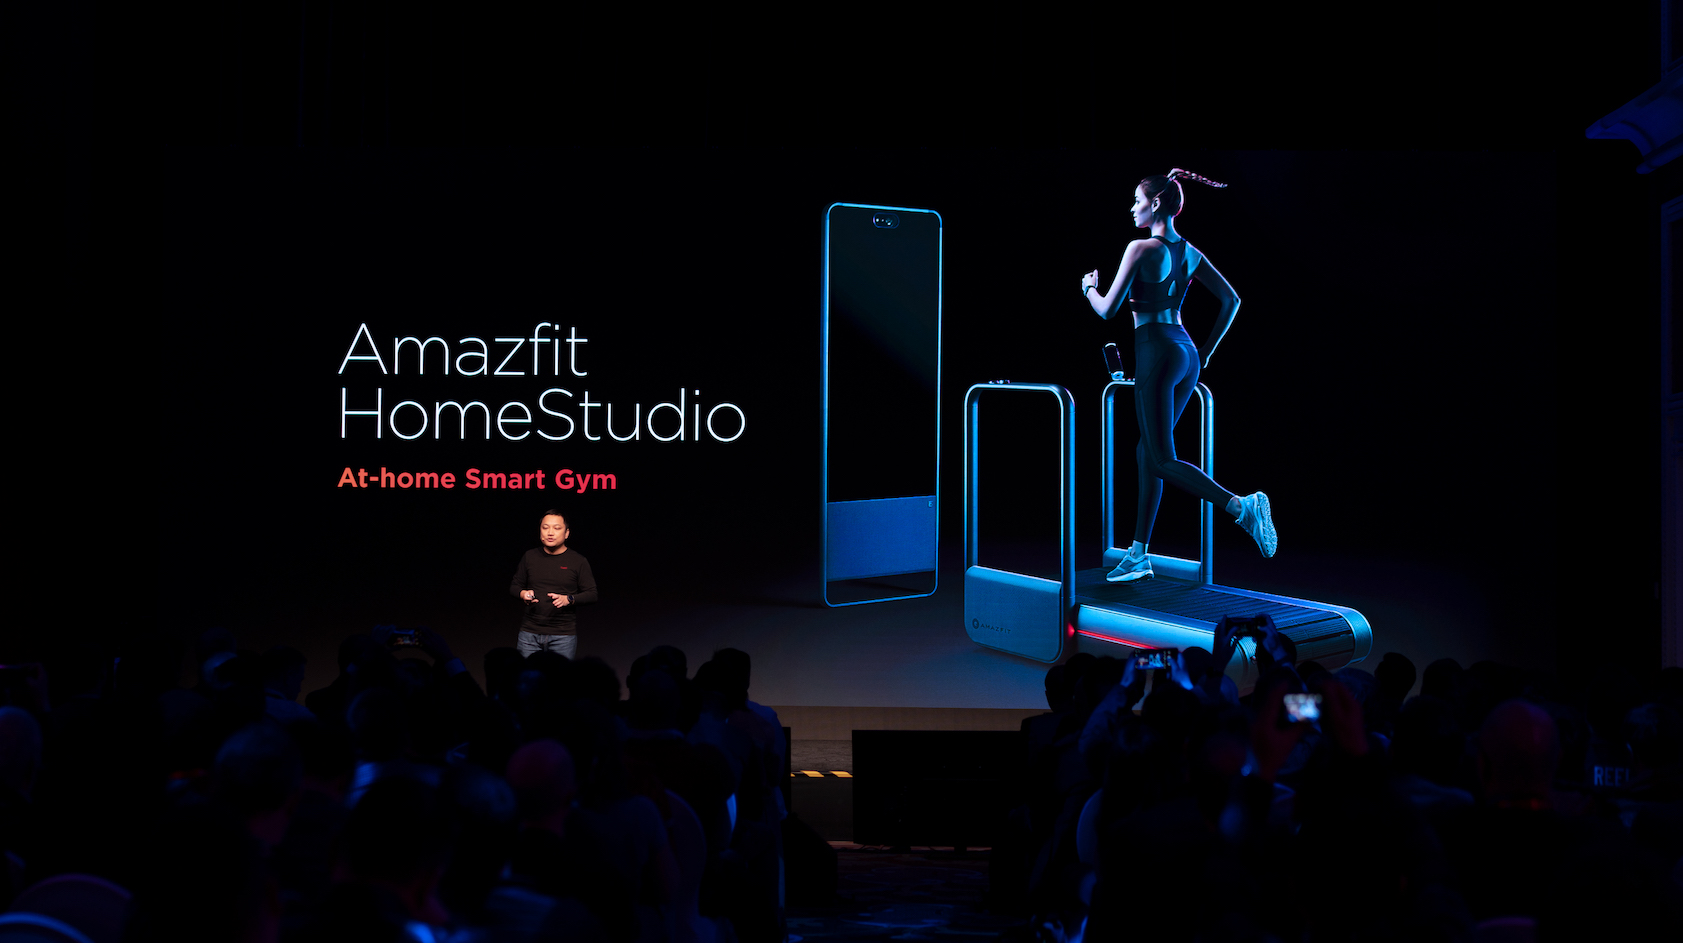 Huami Amazfit: auricolari true wireless e tapis roulant smart al CES 2020 thumbnail